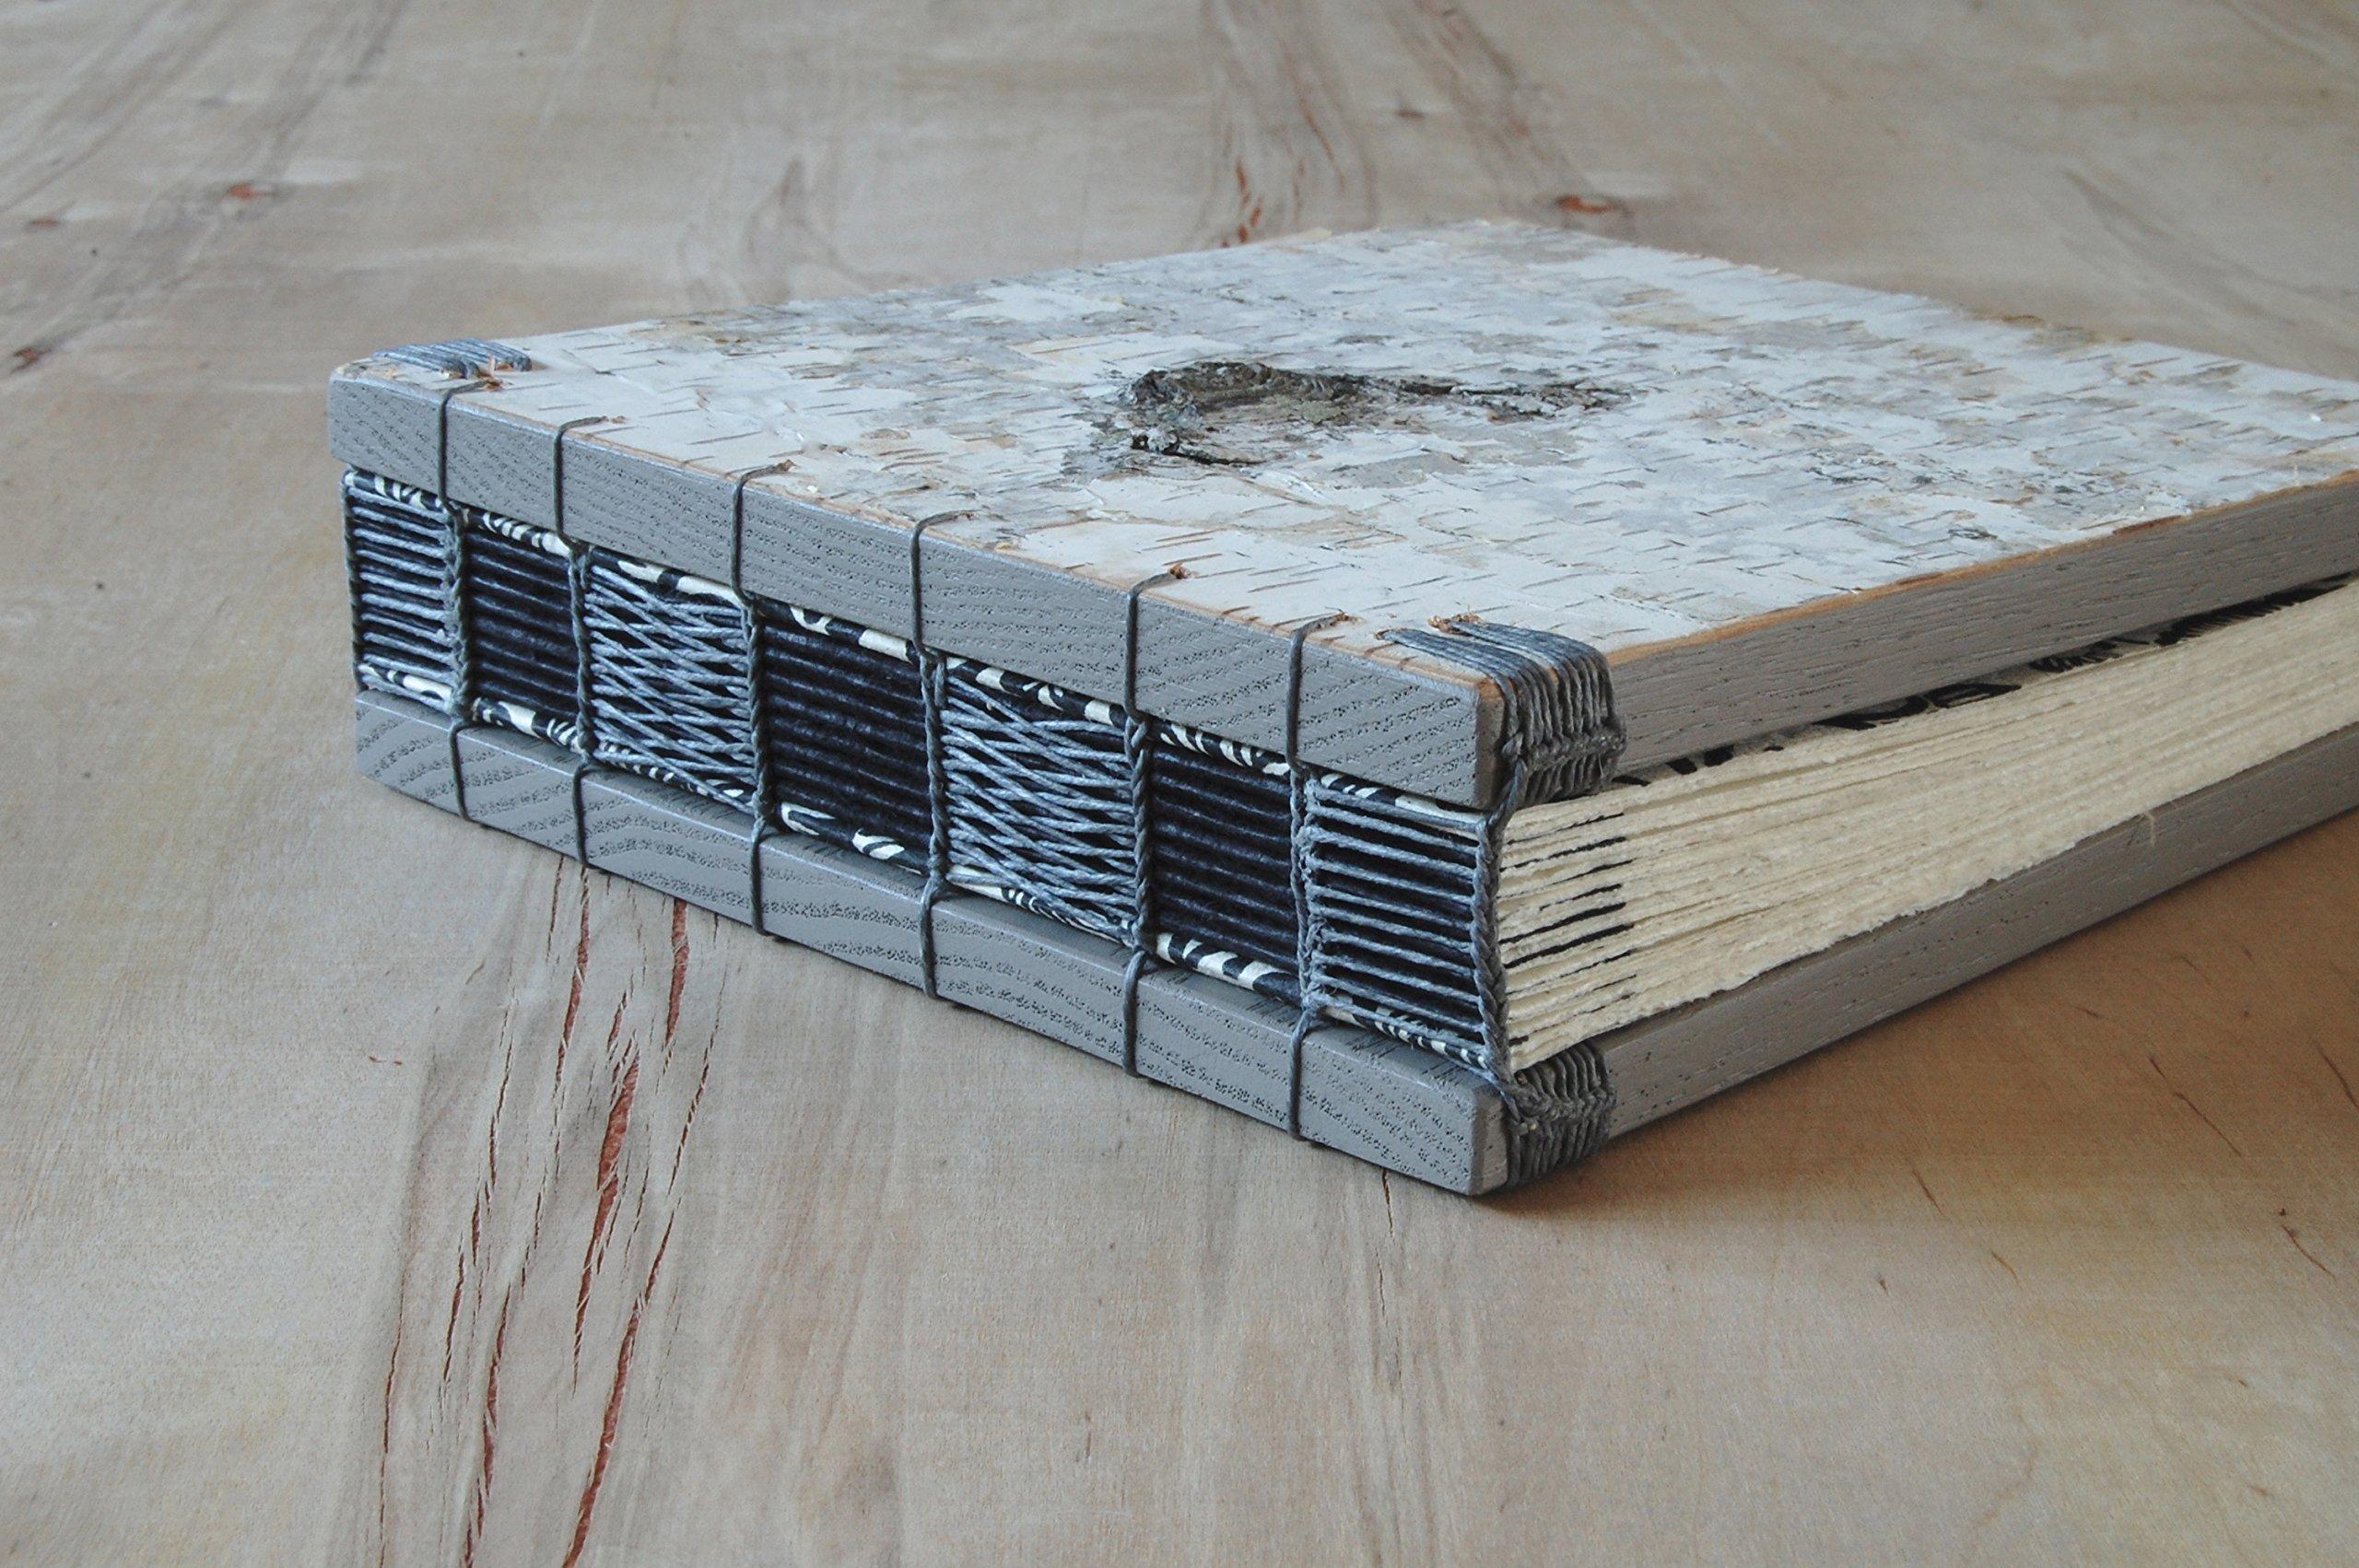 Birch Wood Wedding Guest Book or Handmade Journal by Three Trees Bindery